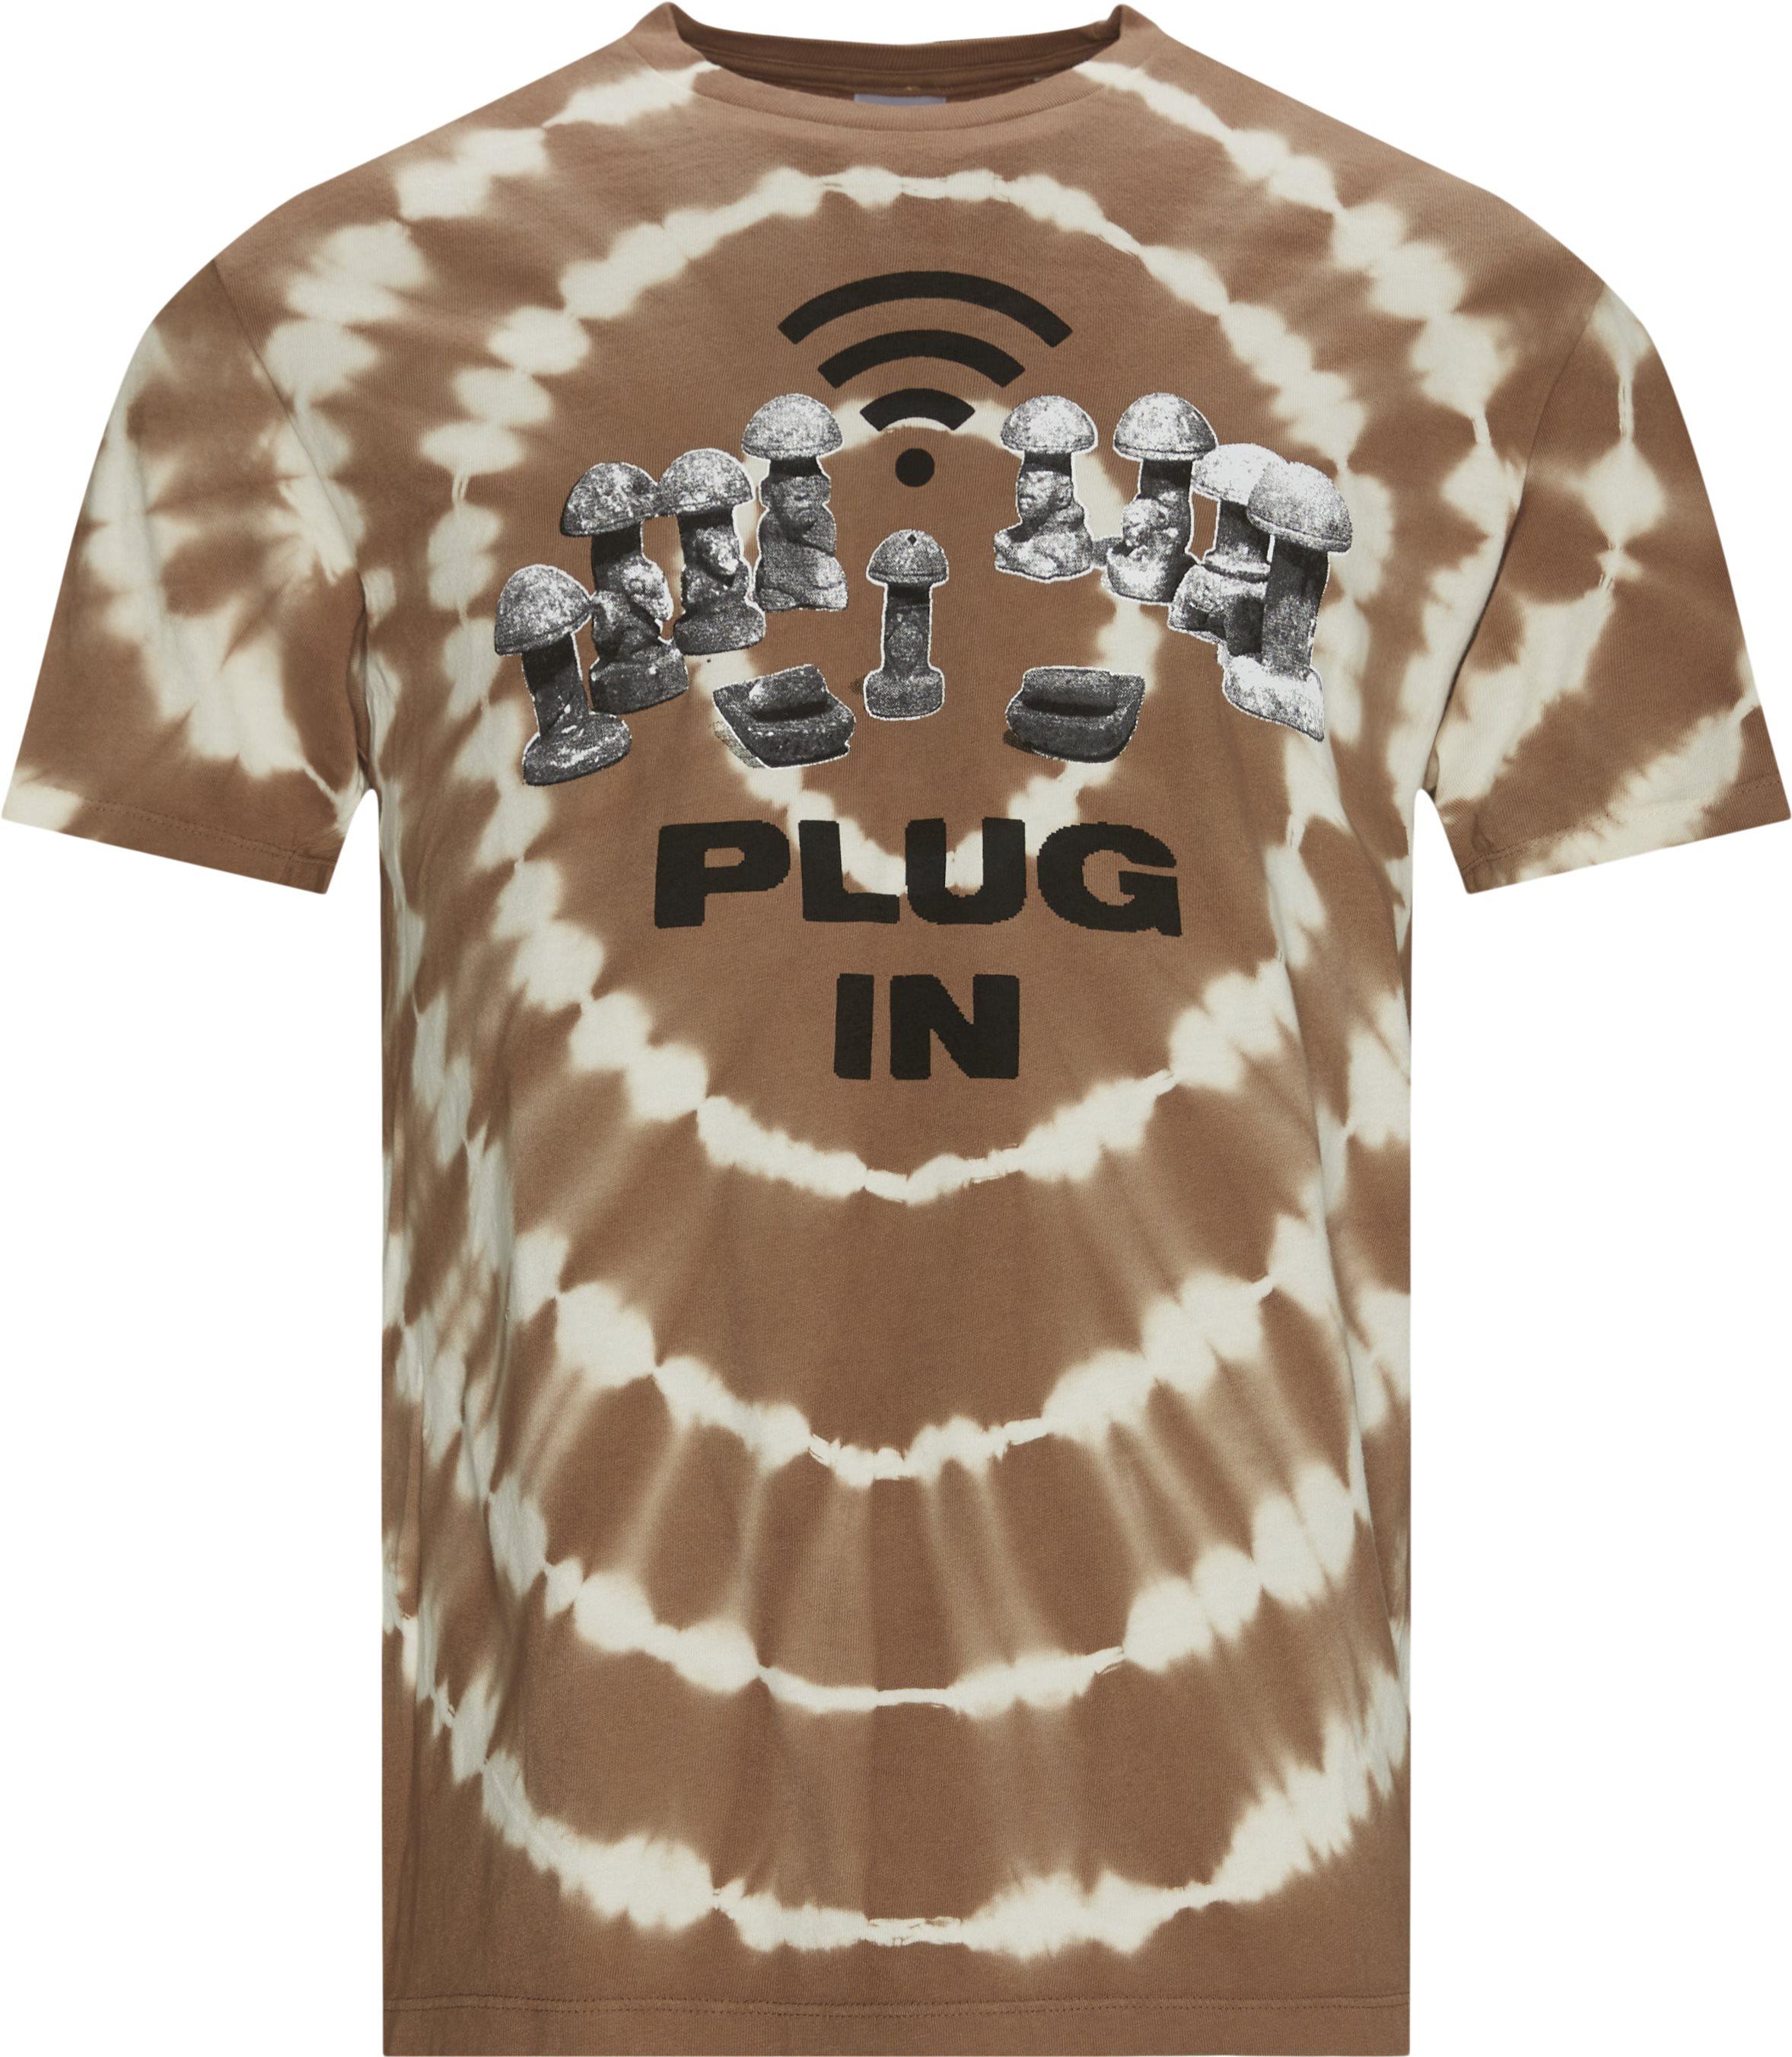 Microdose Plug In Tee - T-shirts - Regular fit - Brun